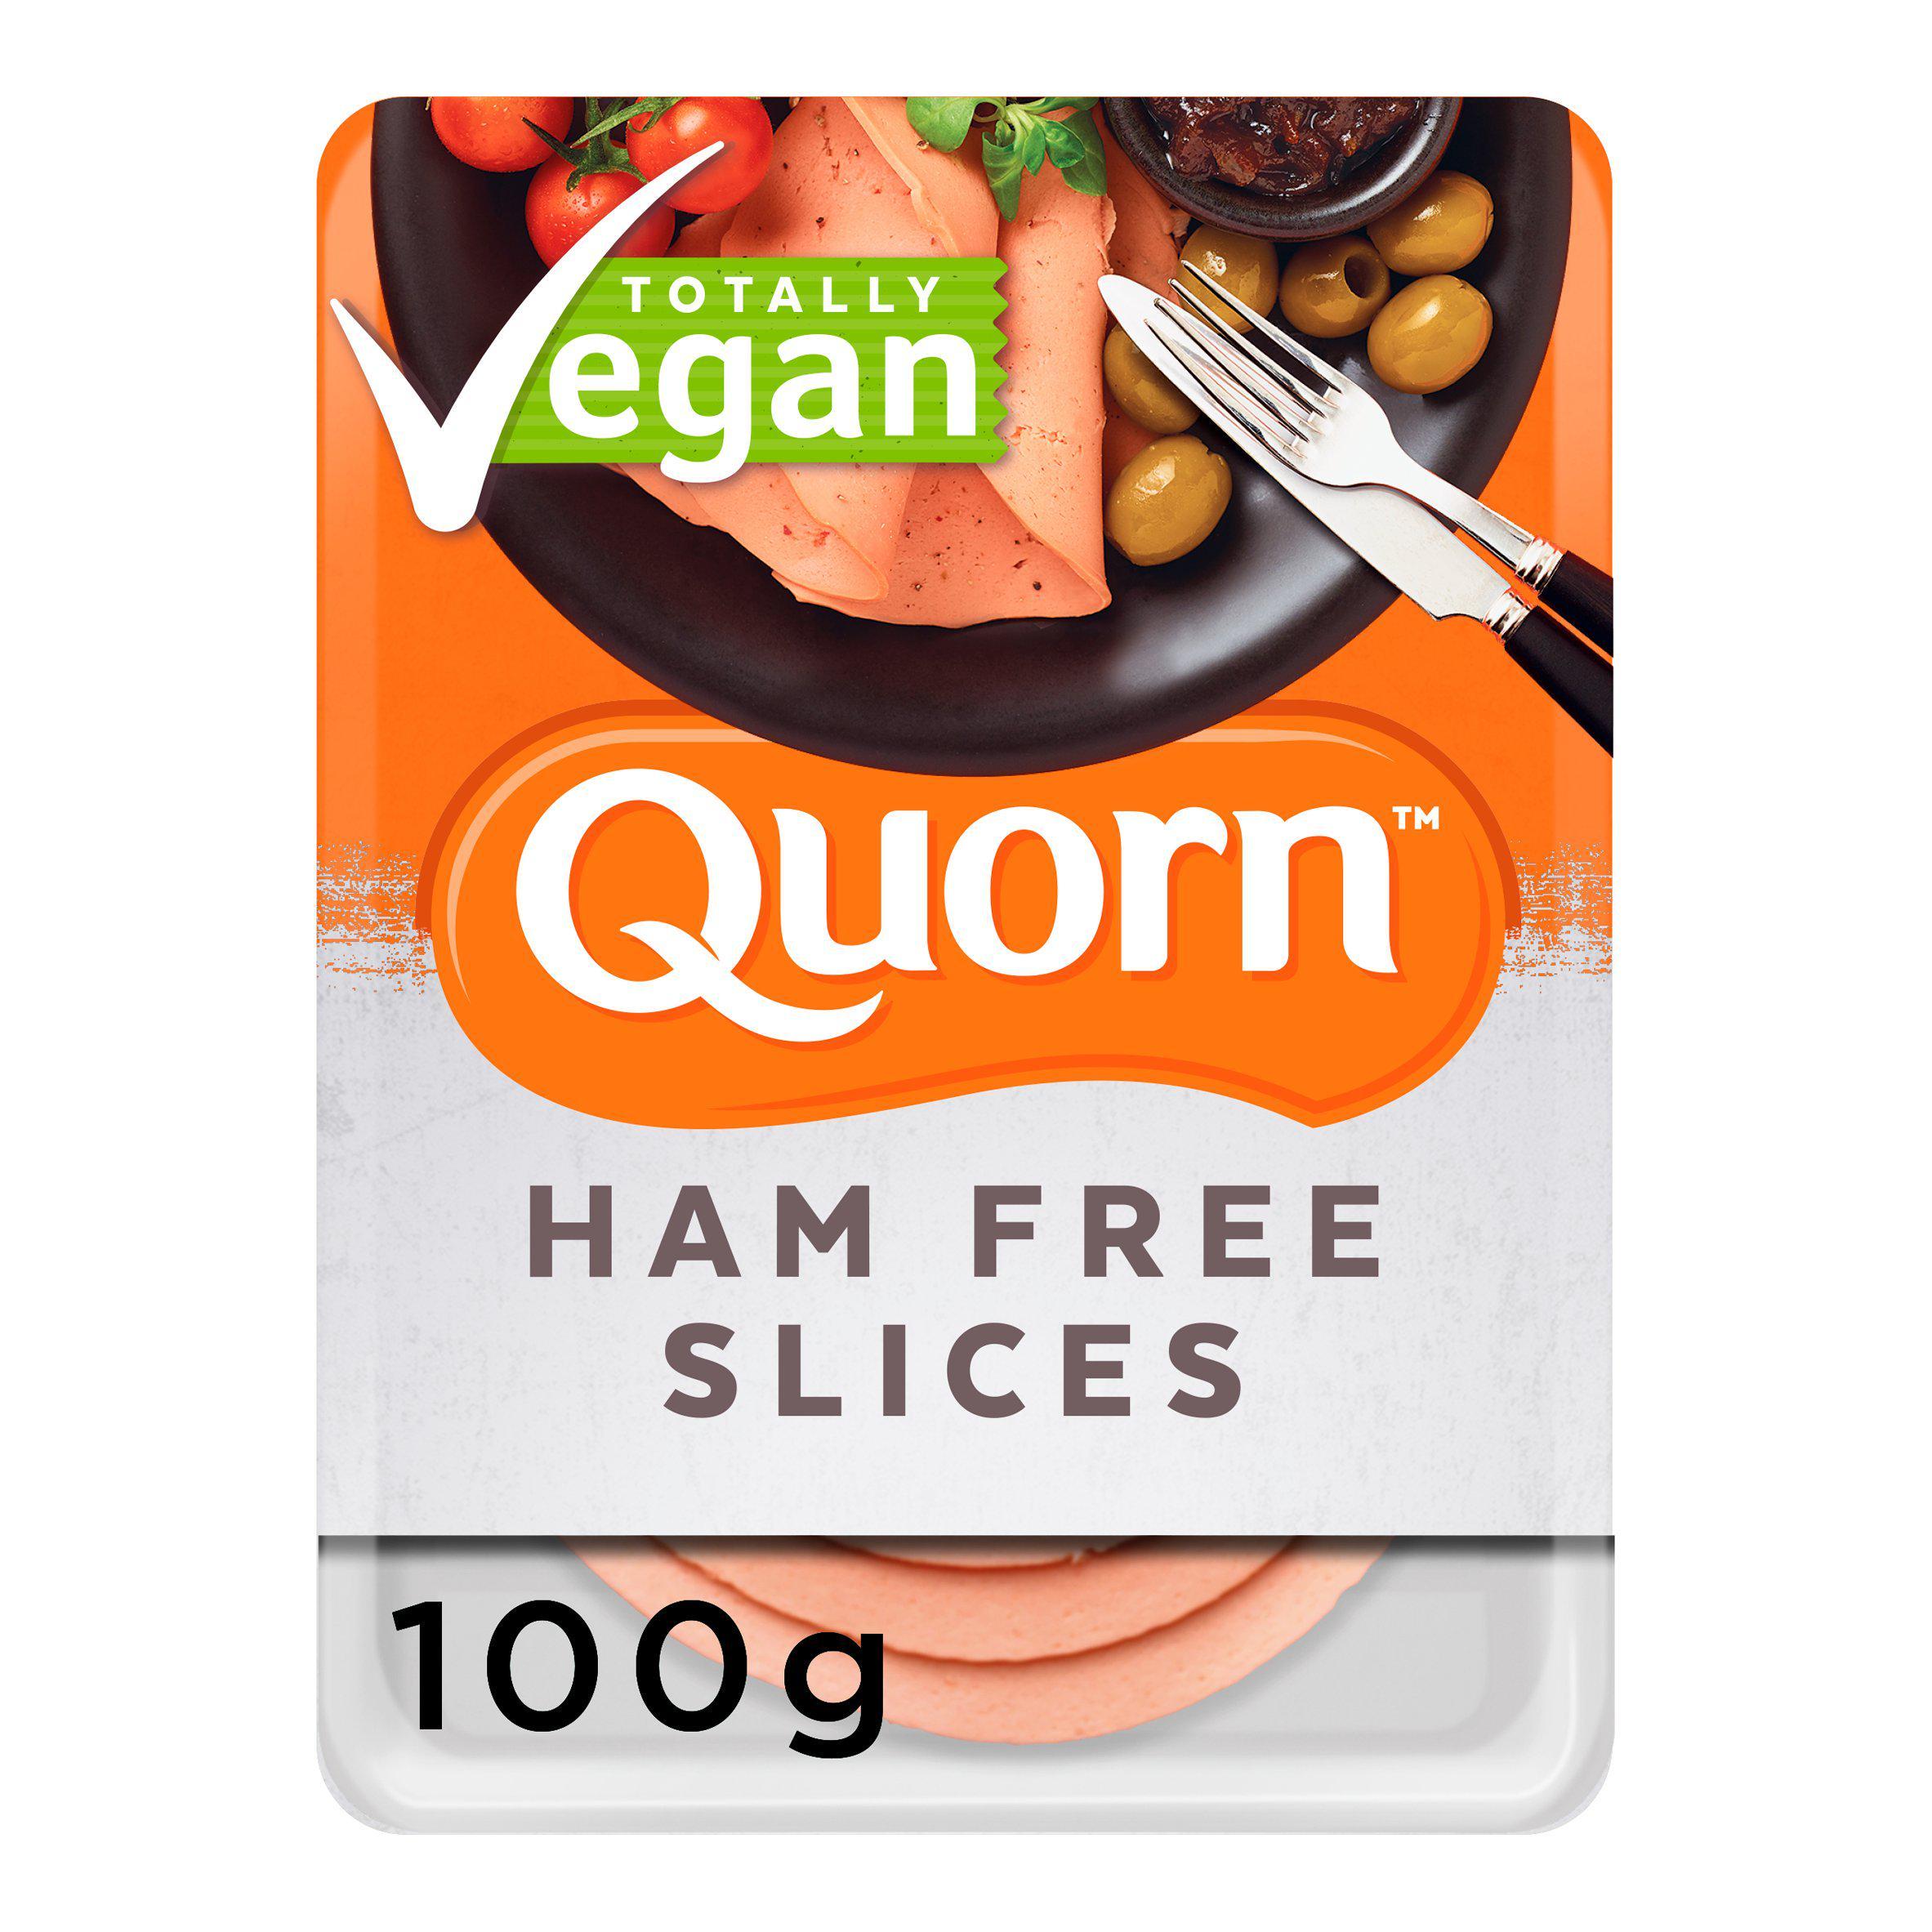 Quorn Vegan Smoky Ham Free Slices 100g or Quorn Vegan Chicken Free Slices 100g - £1.50 @ Sainsbury's